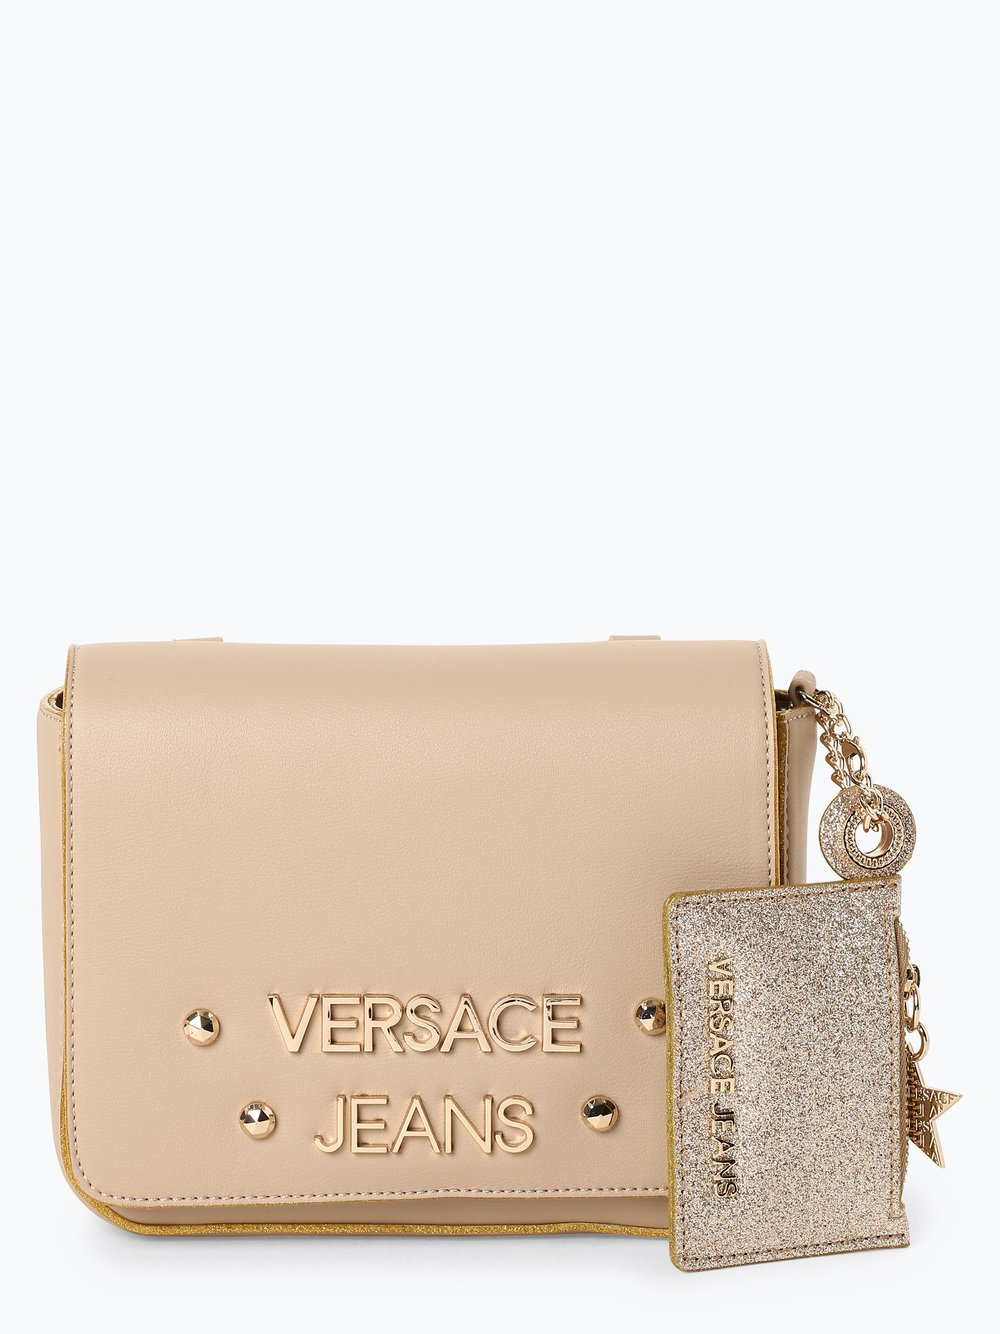 Versace  Jeans - Damska torebka na ramię, beżowy Versace  Jeans